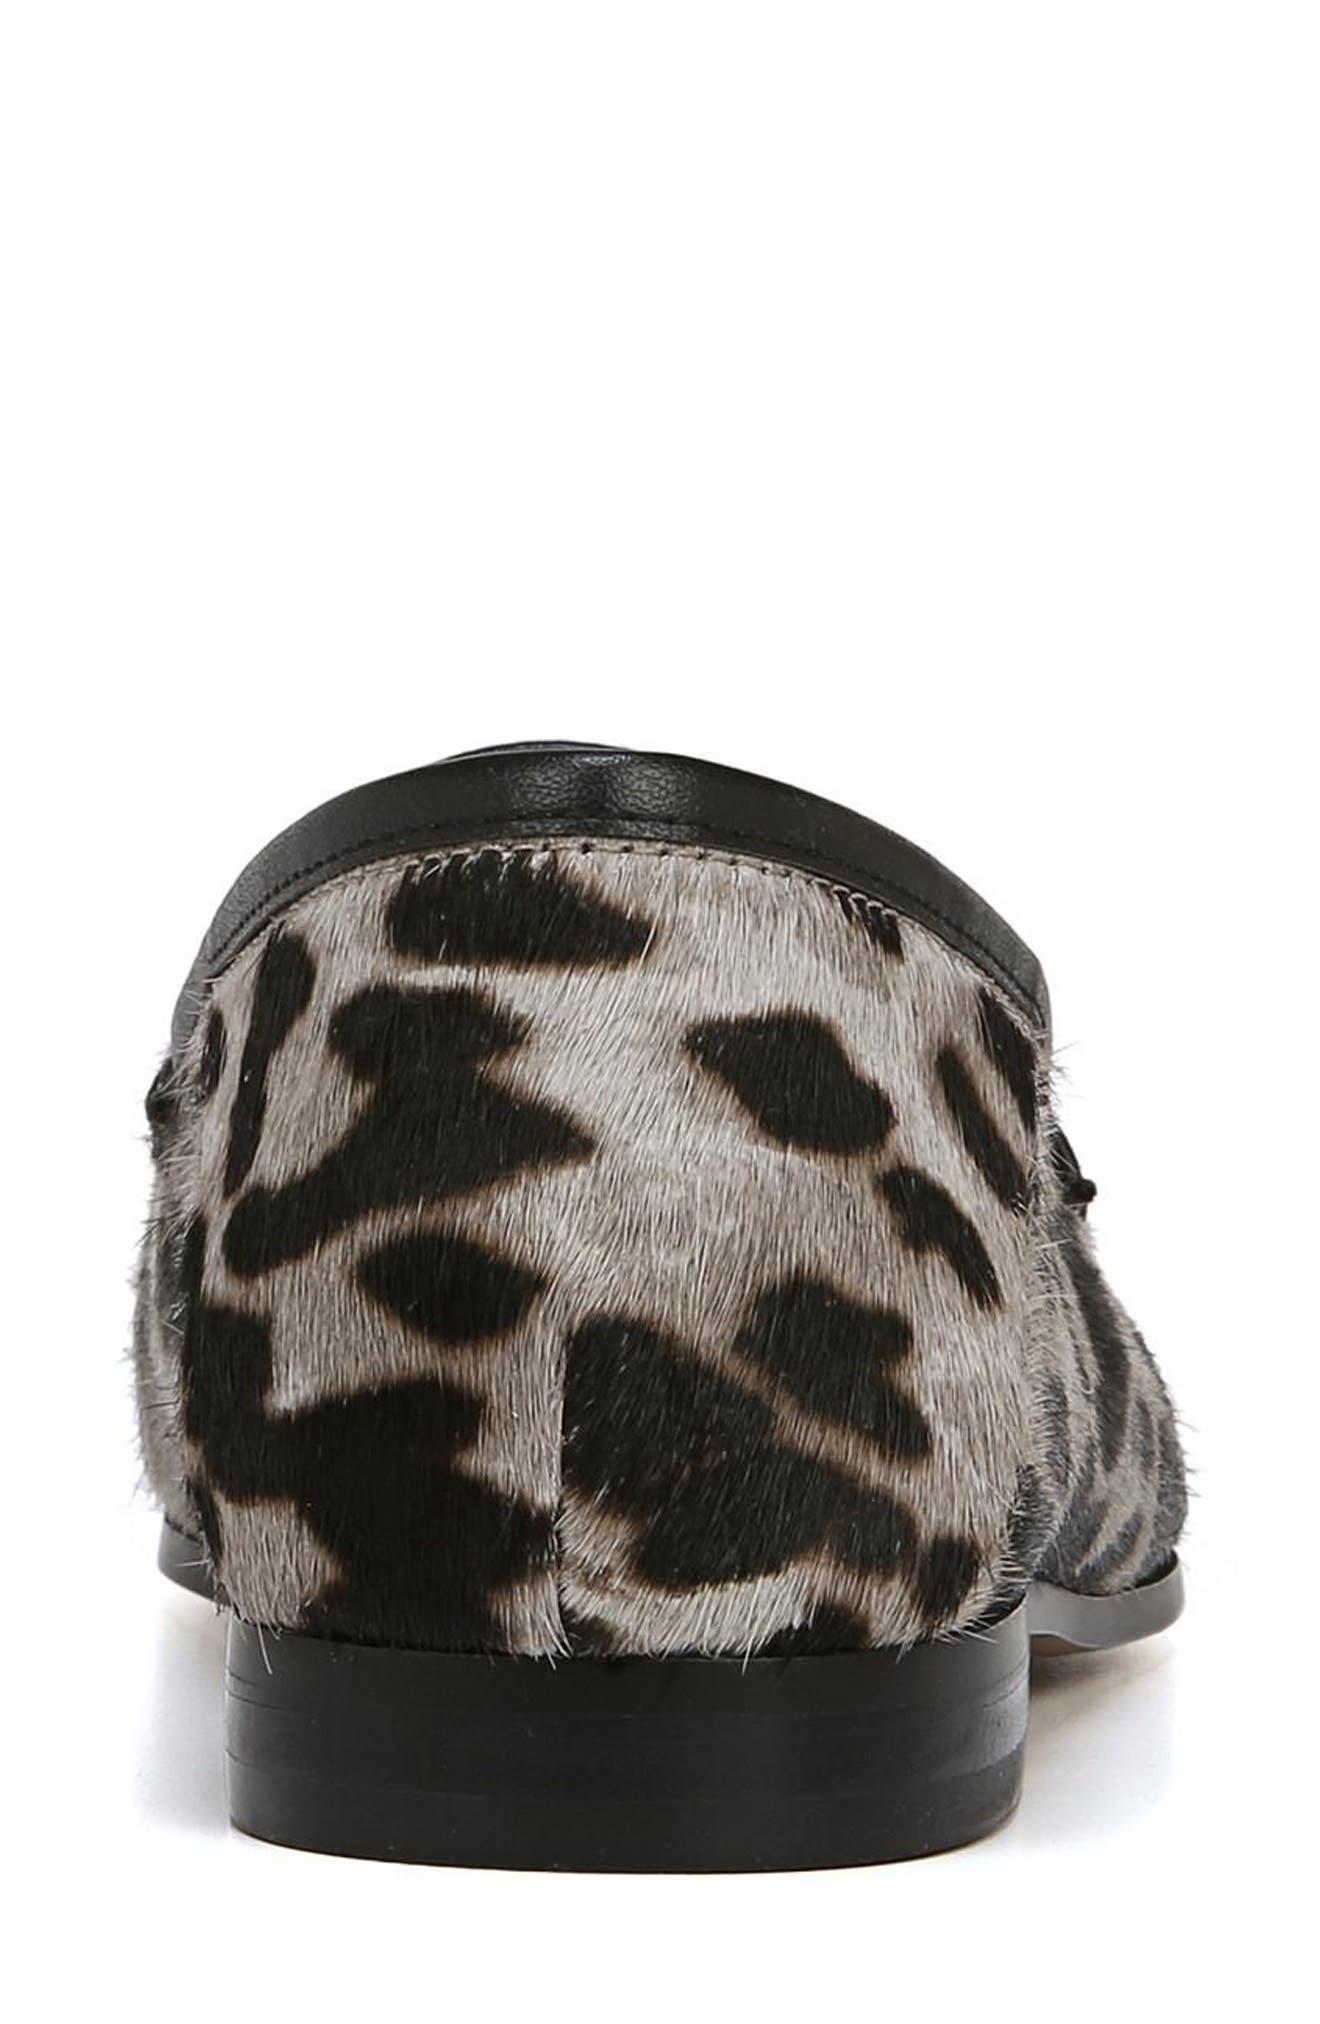 Lior Genuine Calf Hair Loafer,                             Alternate thumbnail 8, color,                             GREY MULTI LEOPARD CALF HAIR